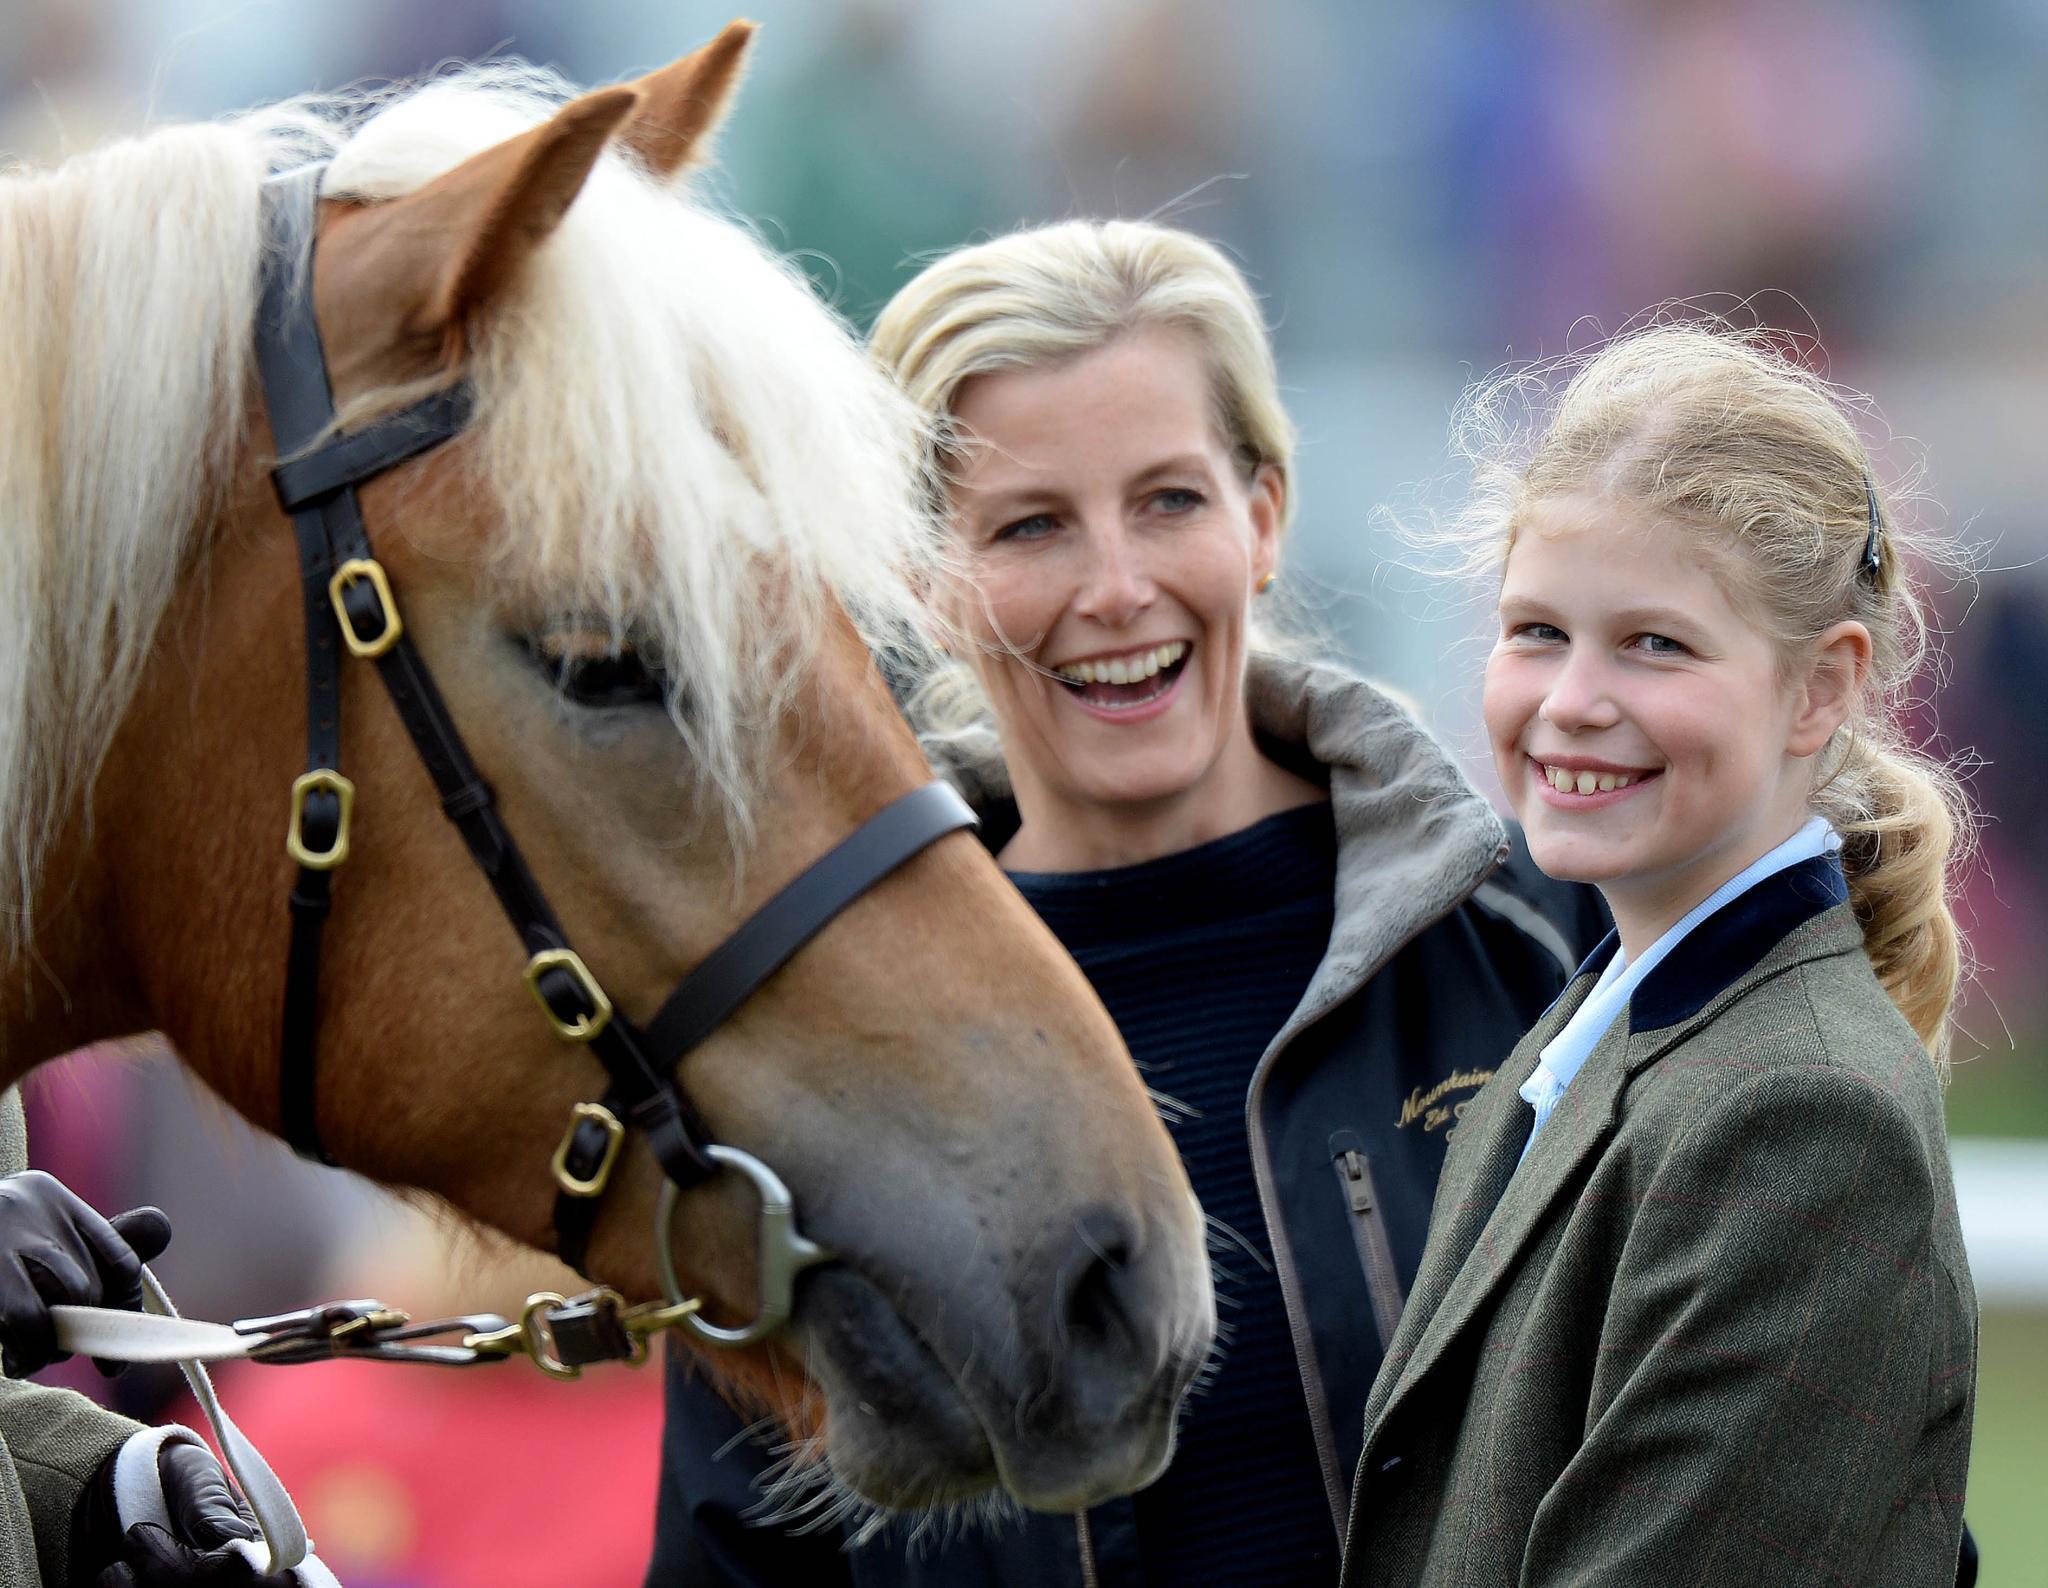 Gräfin Sophie + Lady Louise